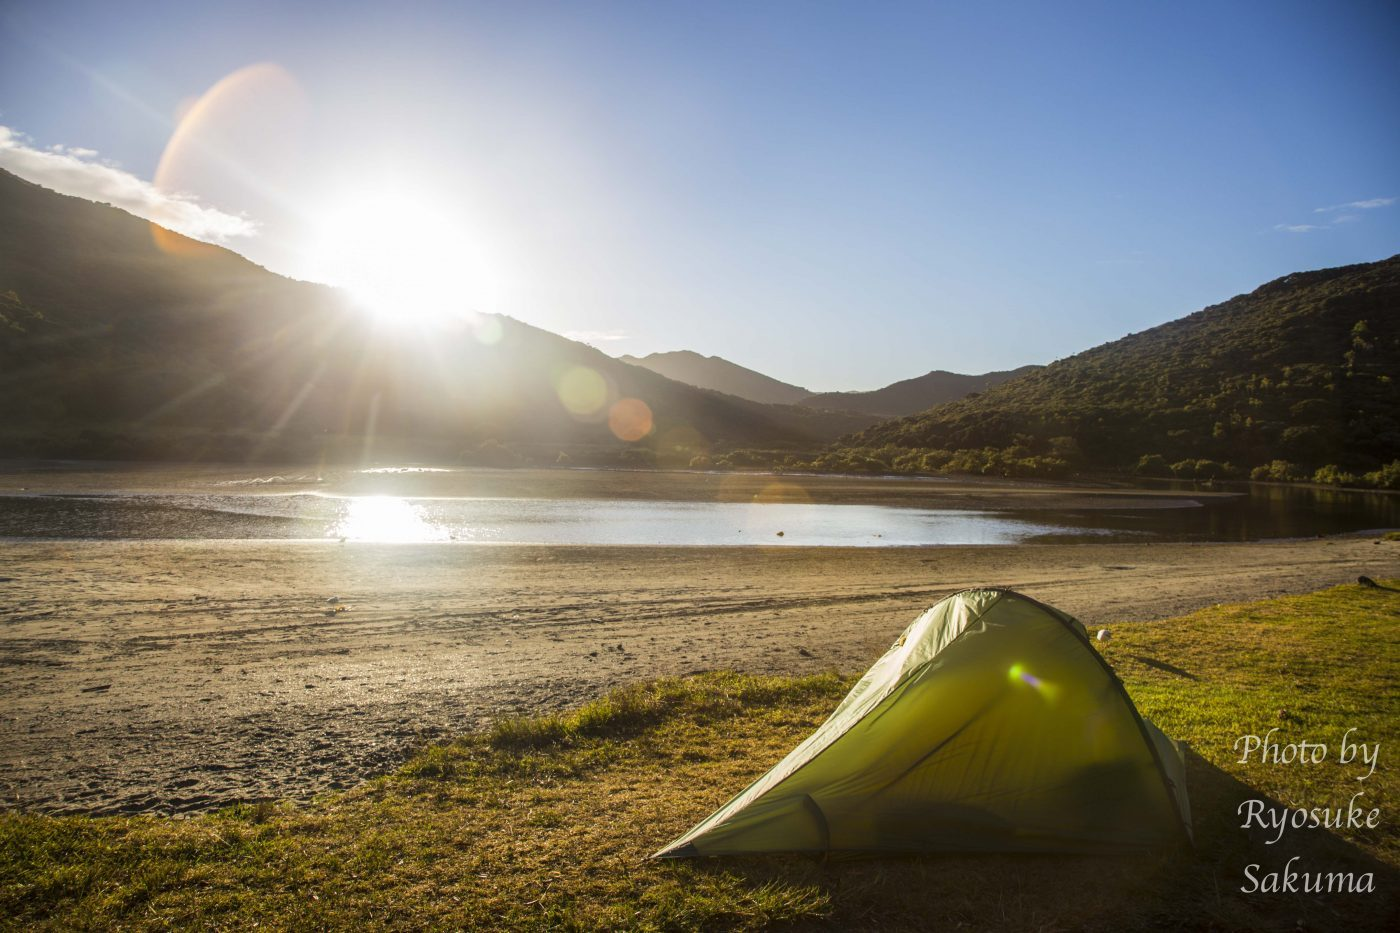 Tapotupotu campsite